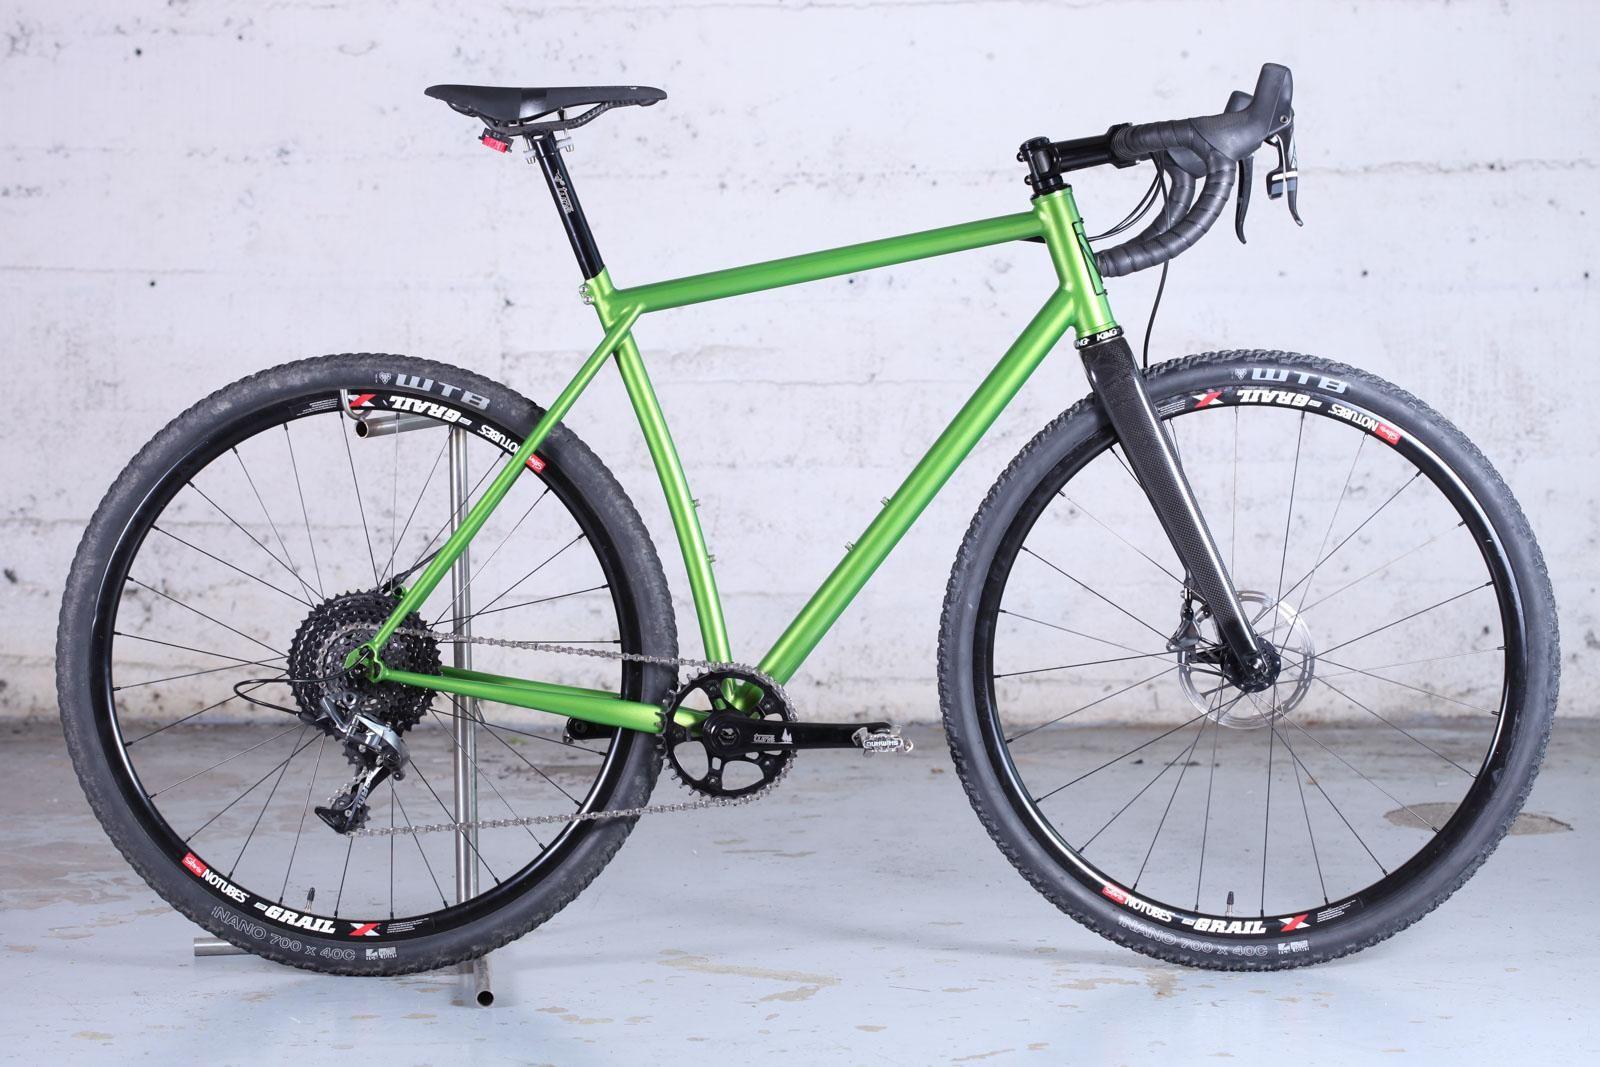 Le Victoire Versus V2 De Remi Velo Gravel Bike Artisanal Sur